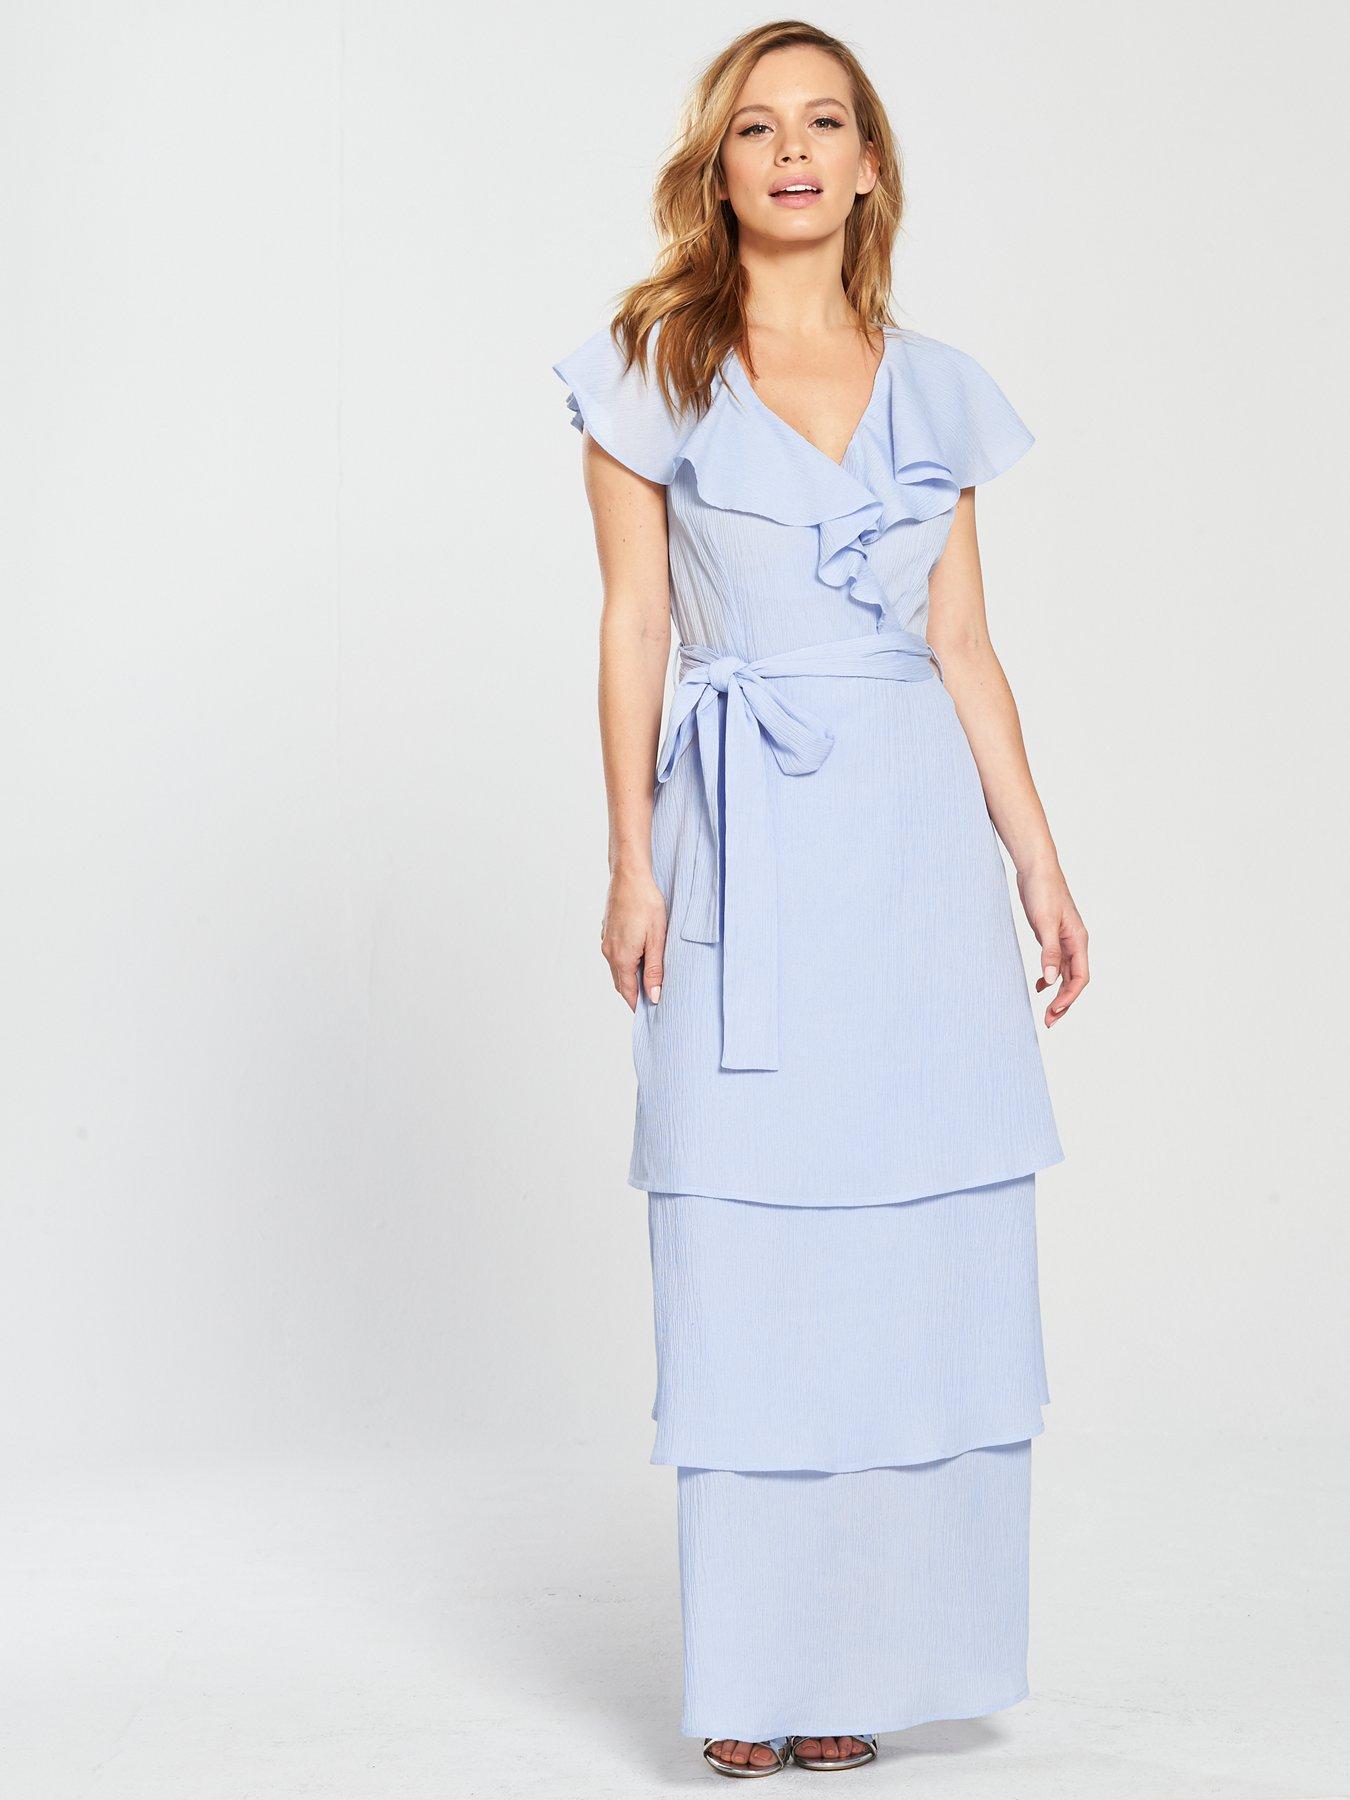 Summer long dresses uk brands